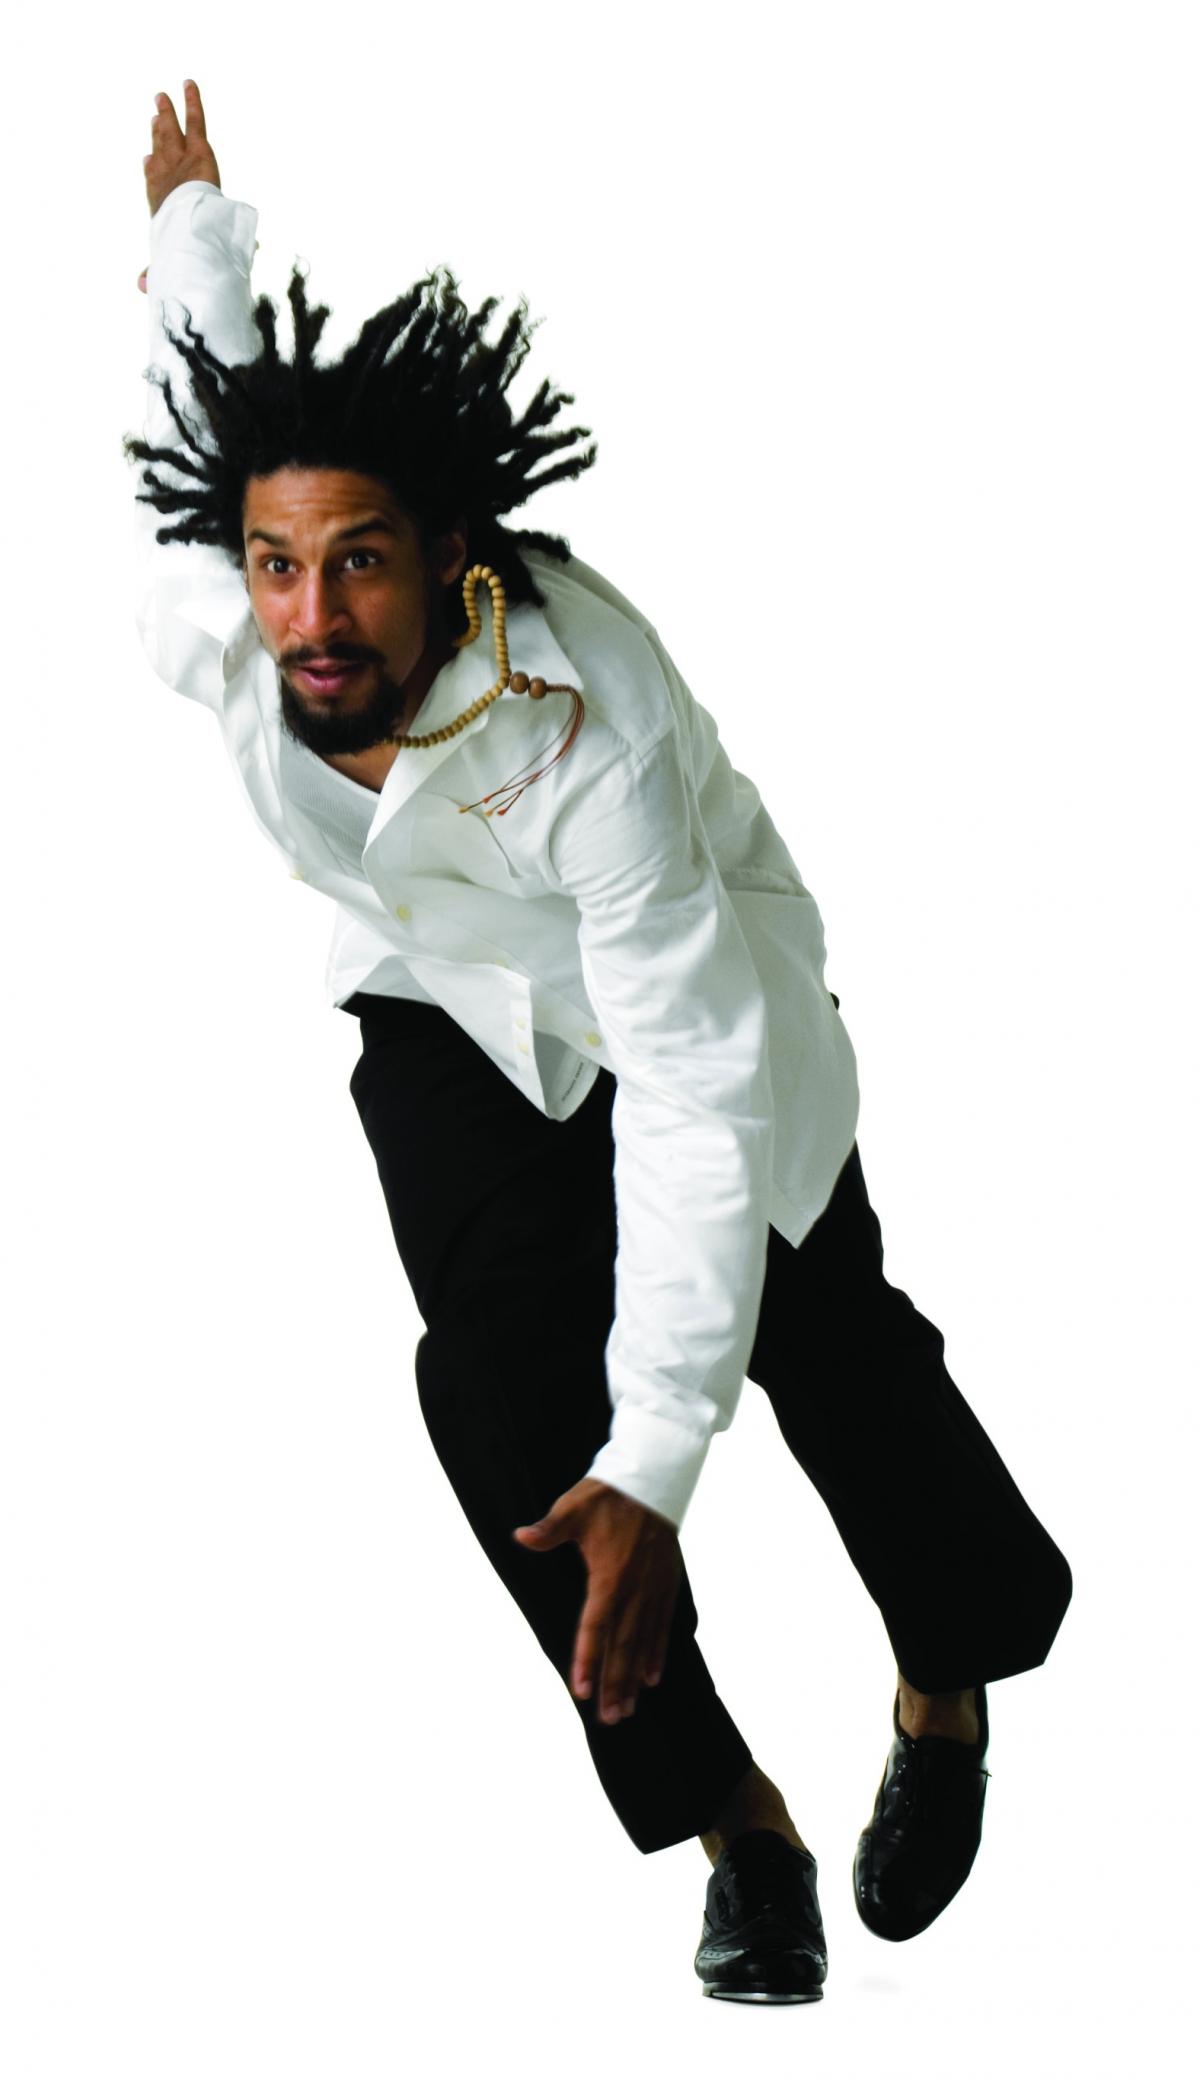 Jason Samuels Smith: image courtesy Eduardo Patino and BLOCH & DIvine Rhythm Productions